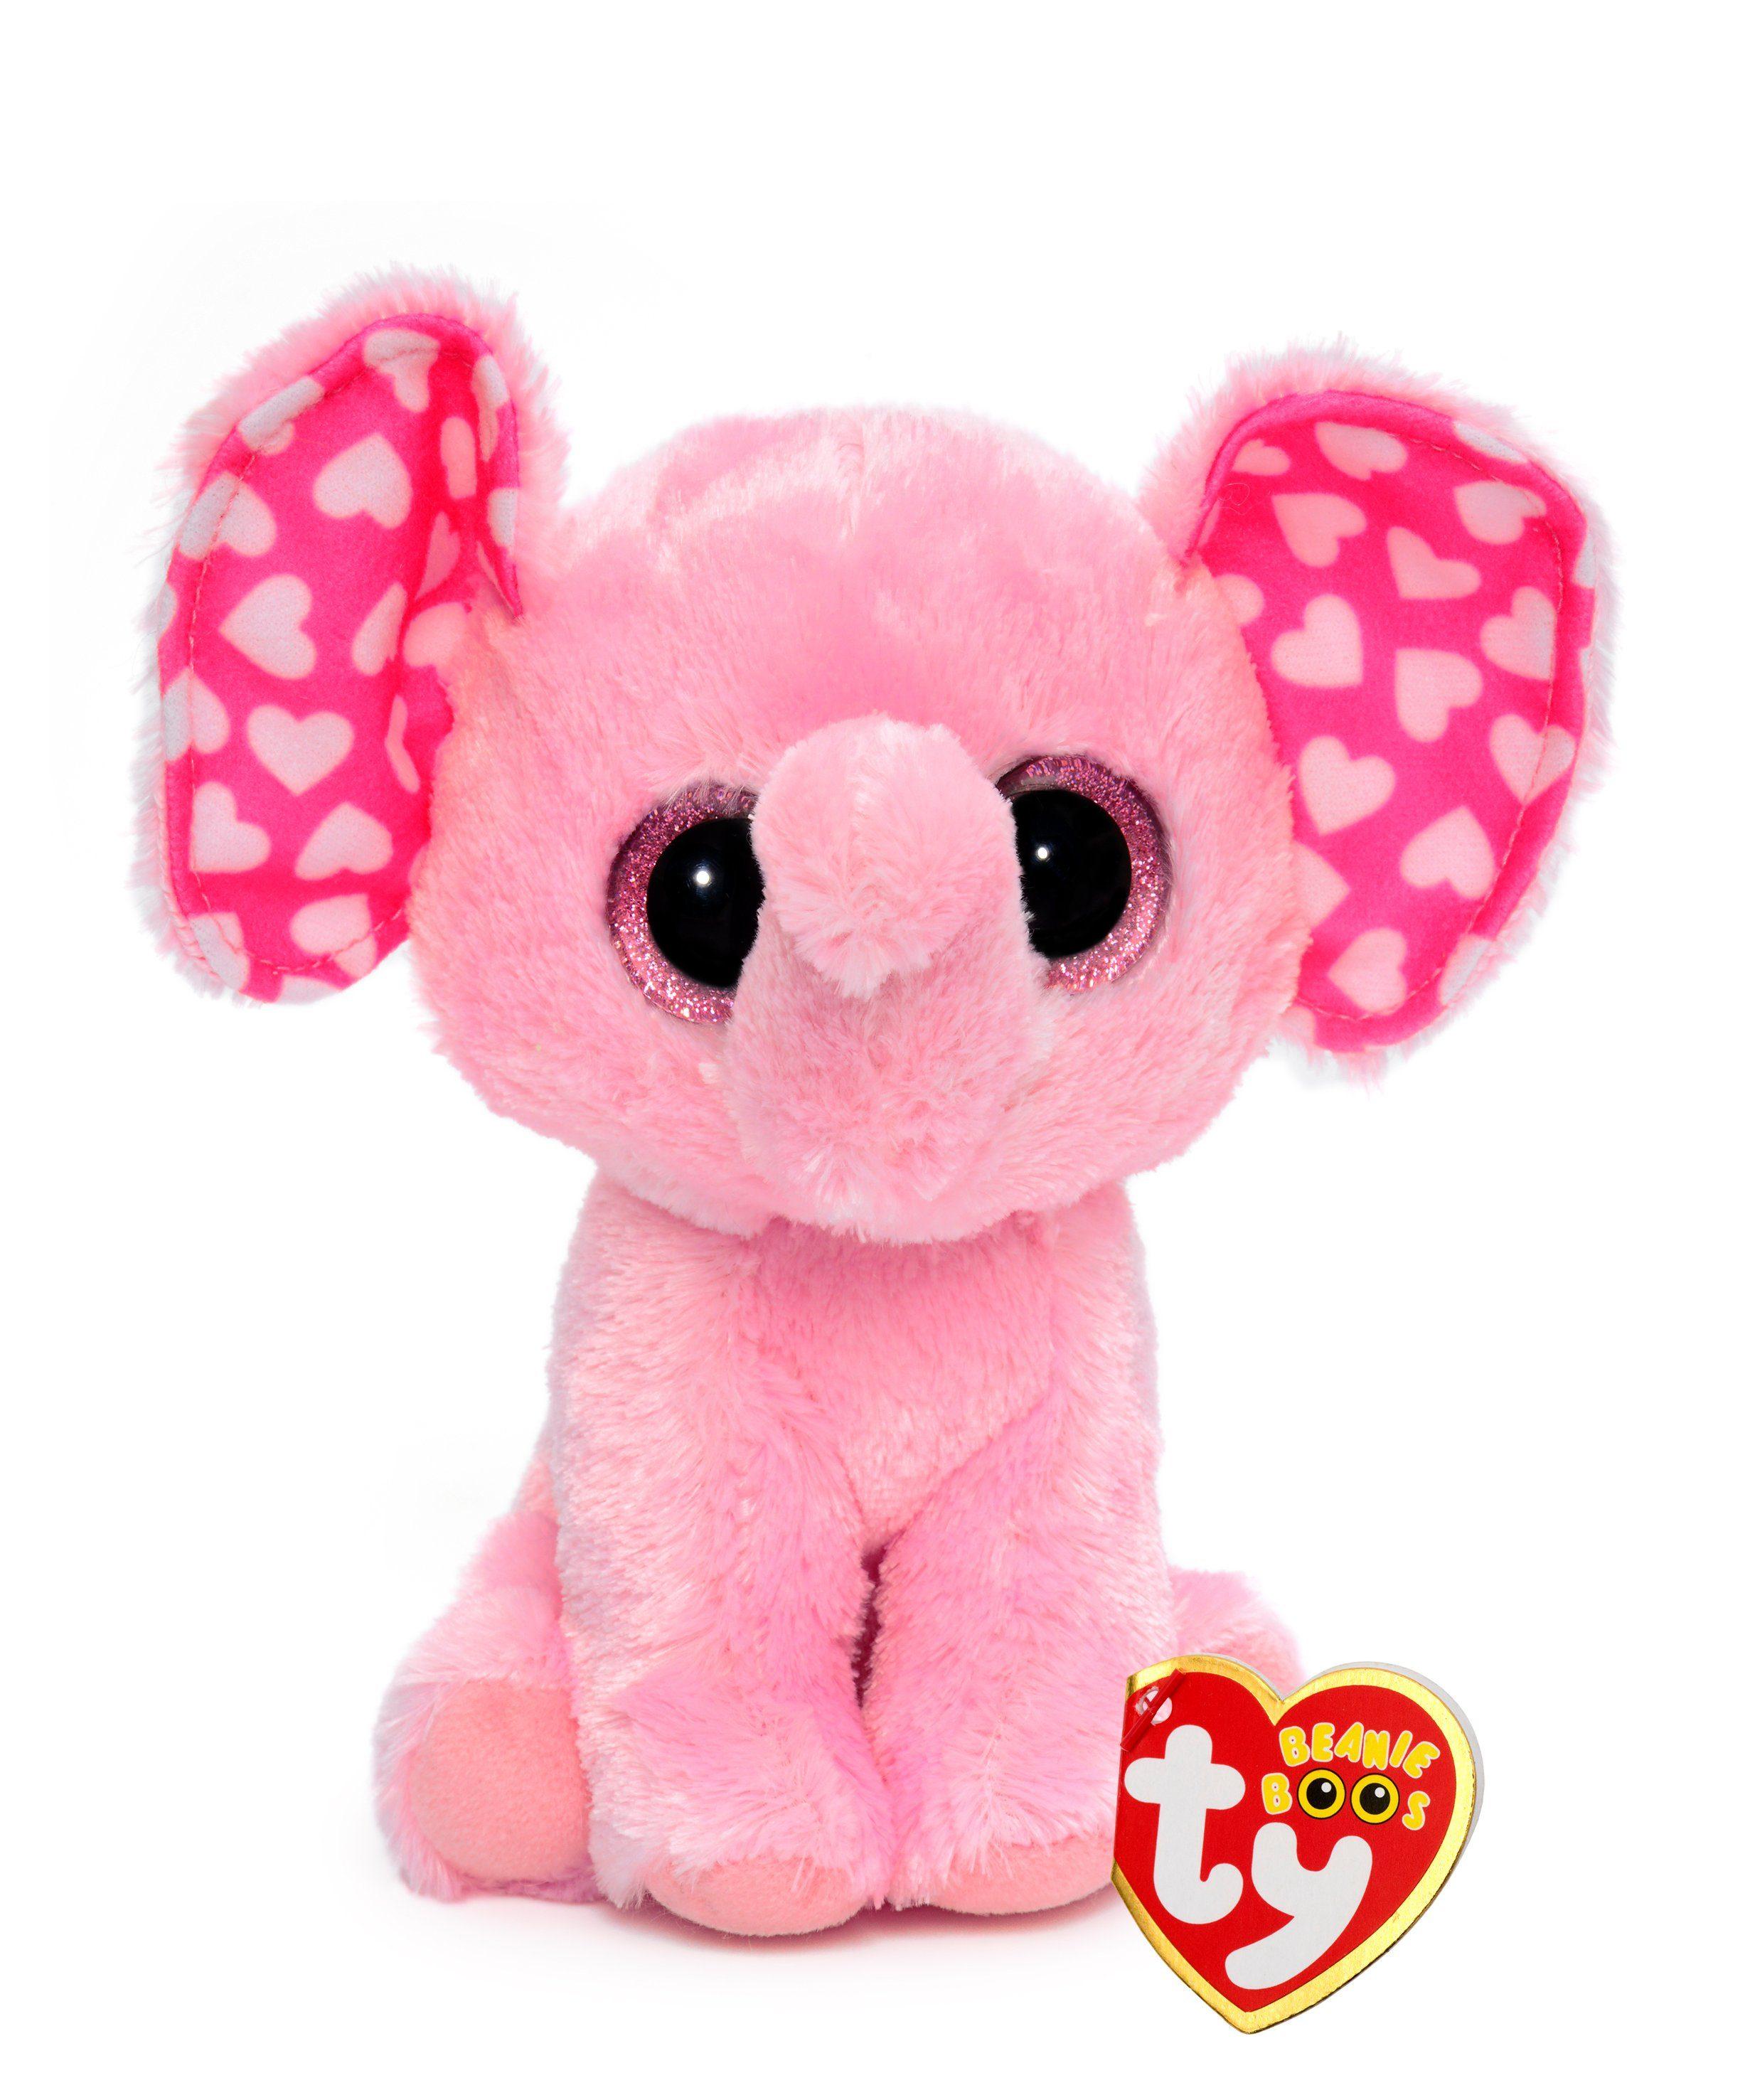 TY Beanie Boo's Glubschis »Sugar Elefant«